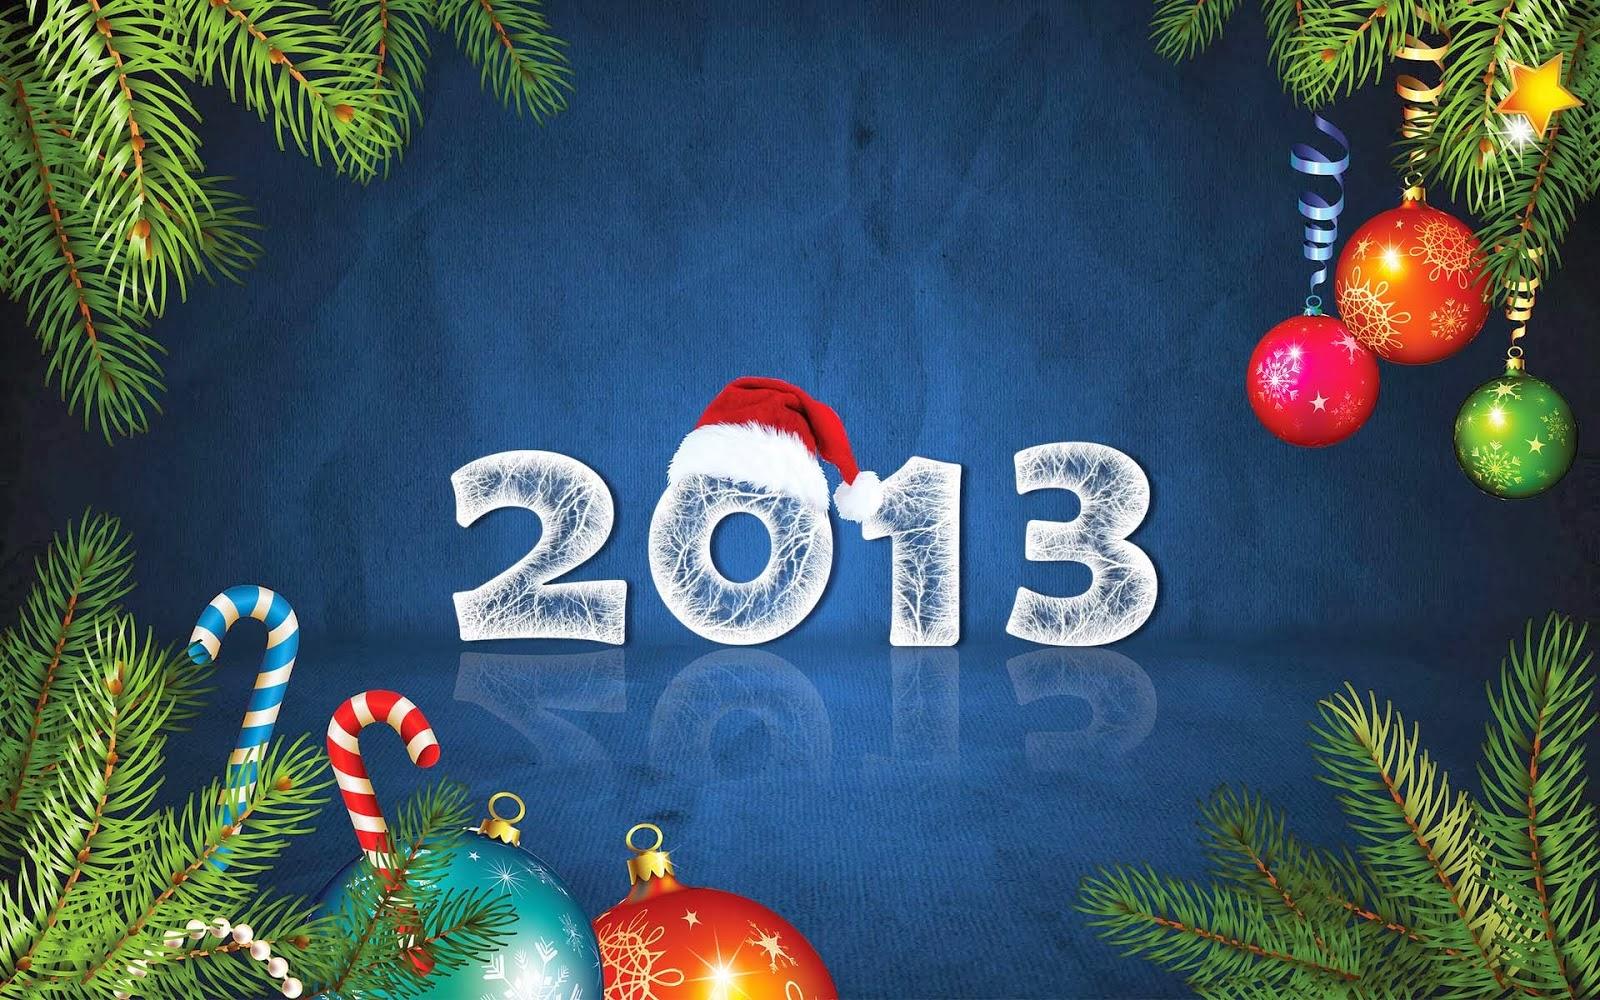 Wat Rob Zegt Kerst 2013